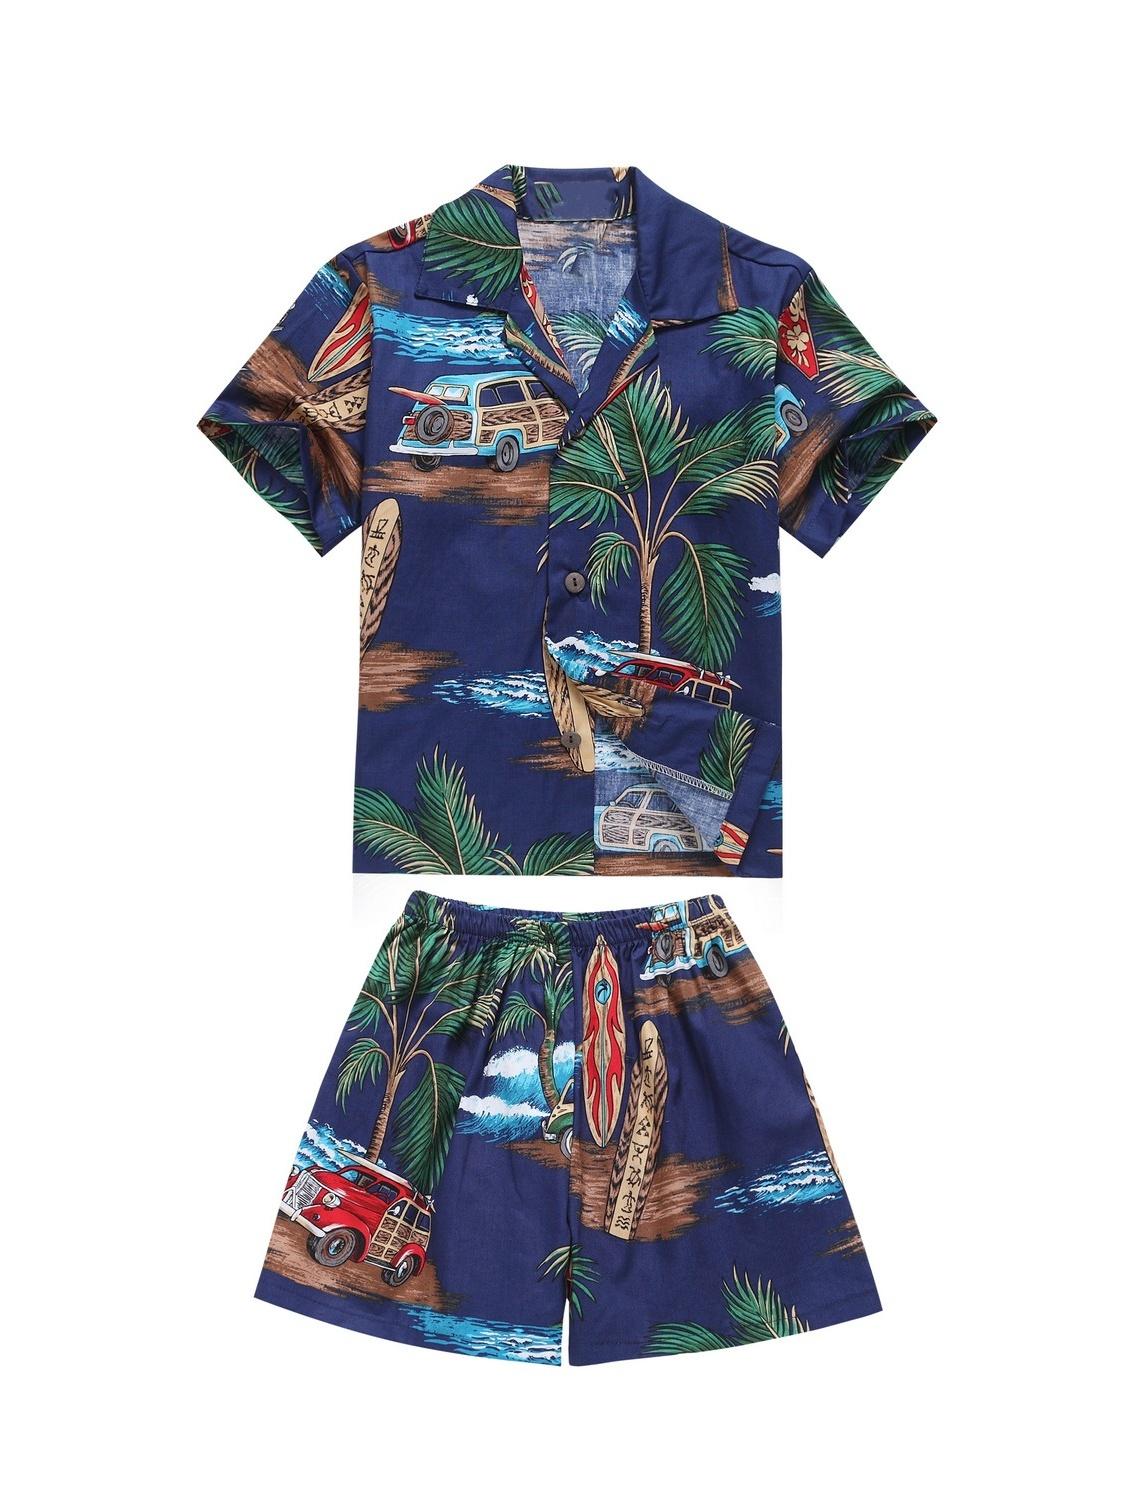 Made in Hawaii Luau Aloha Shirt and Shorts Boy Cabana Set Palm Mini Surfboards Blue 6